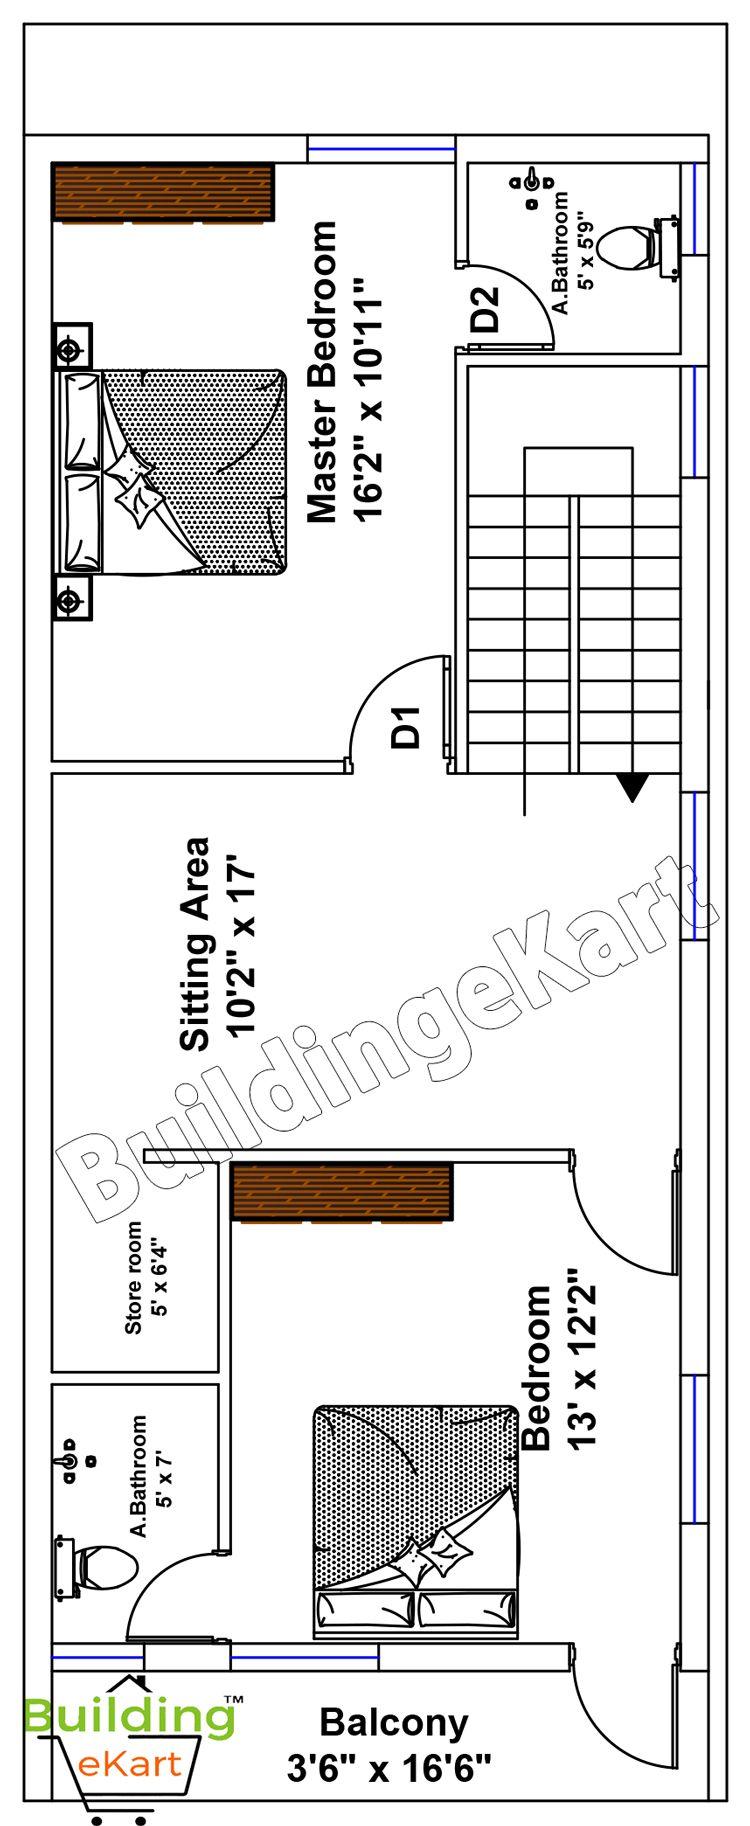 20 60 Duplex House Plan In Prakasam District Andhra Pradesh Duplex House Plans House Plans Building Construction Materials